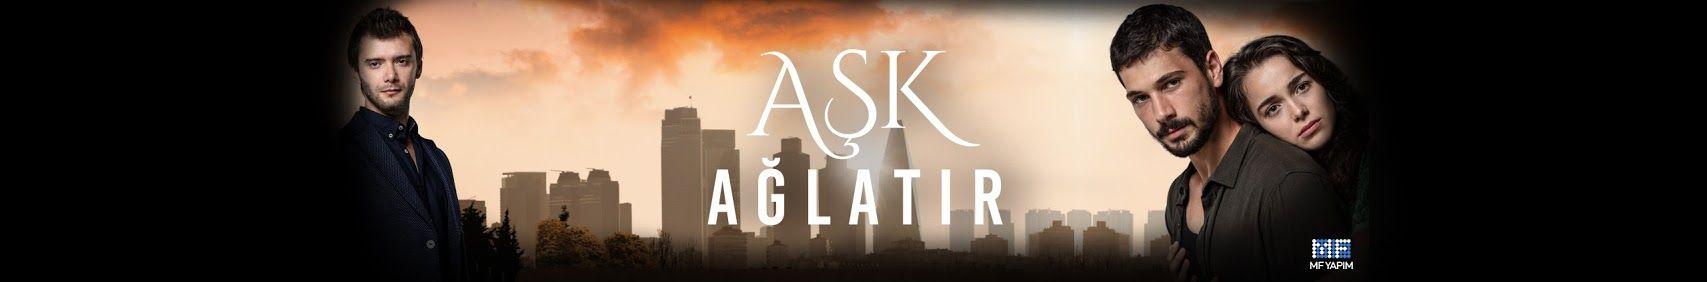 Ask Aglatir English Subtitles | Love Cries